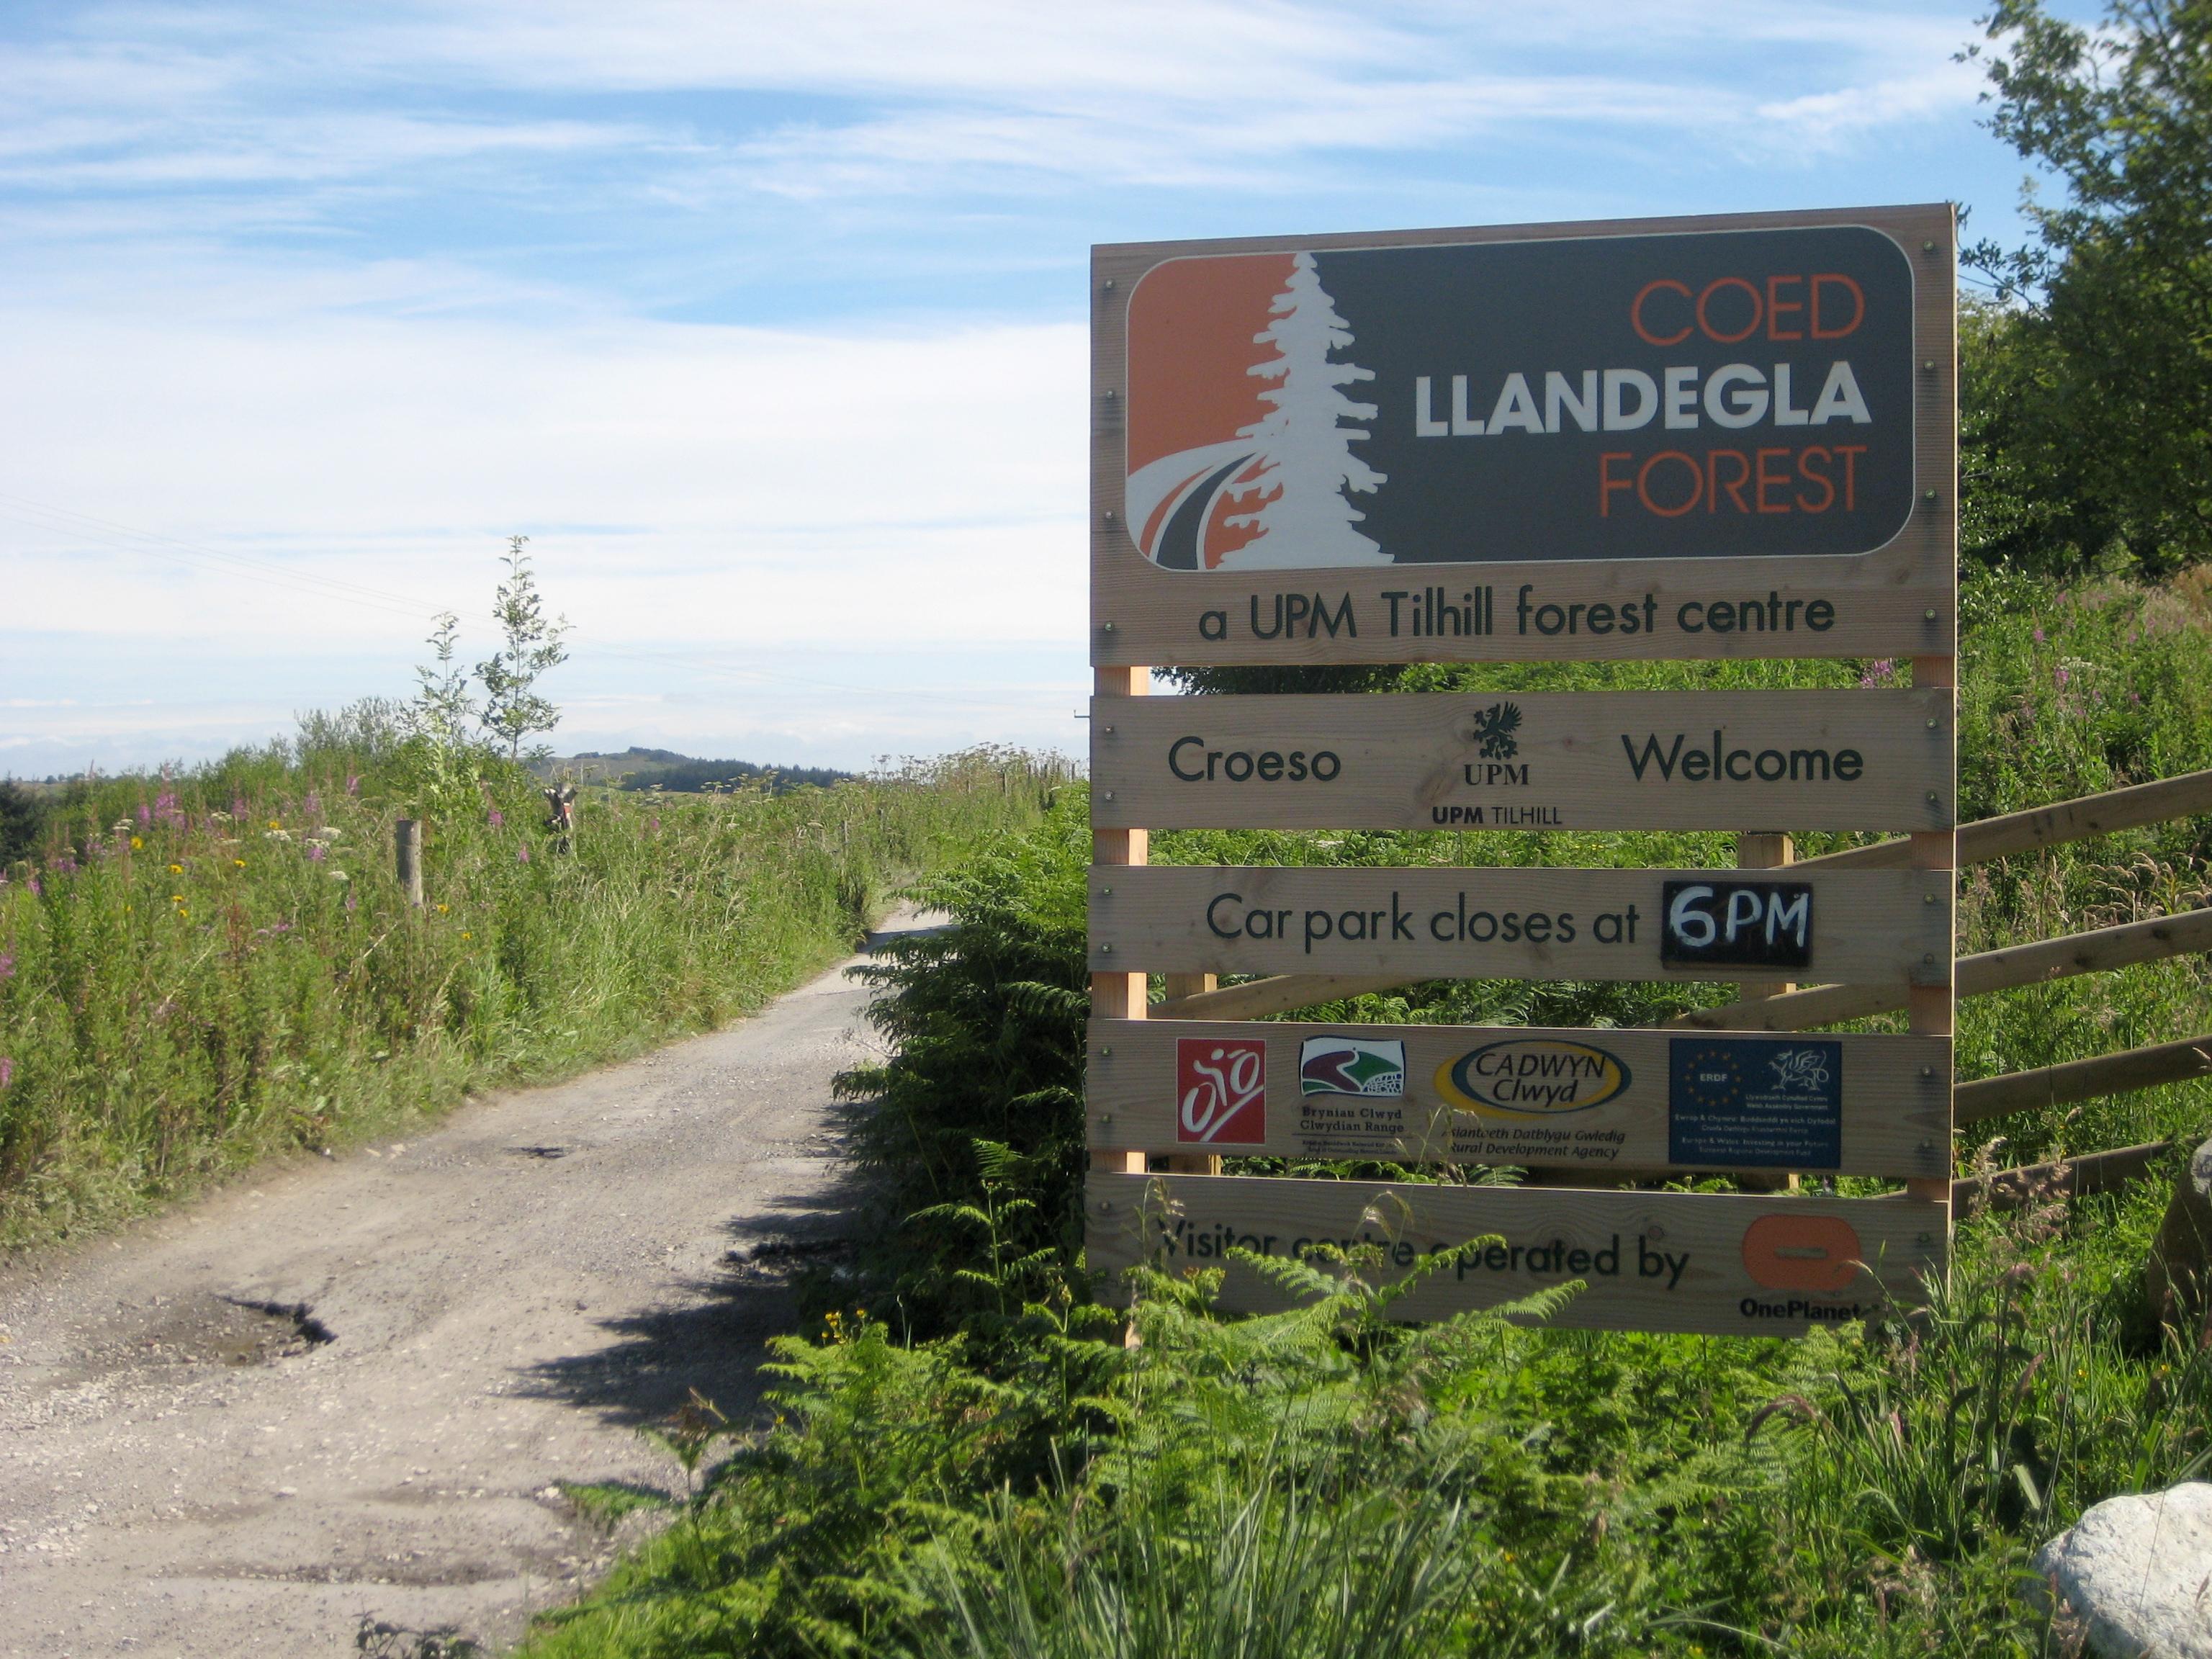 Green Trail, Coed Llandegla